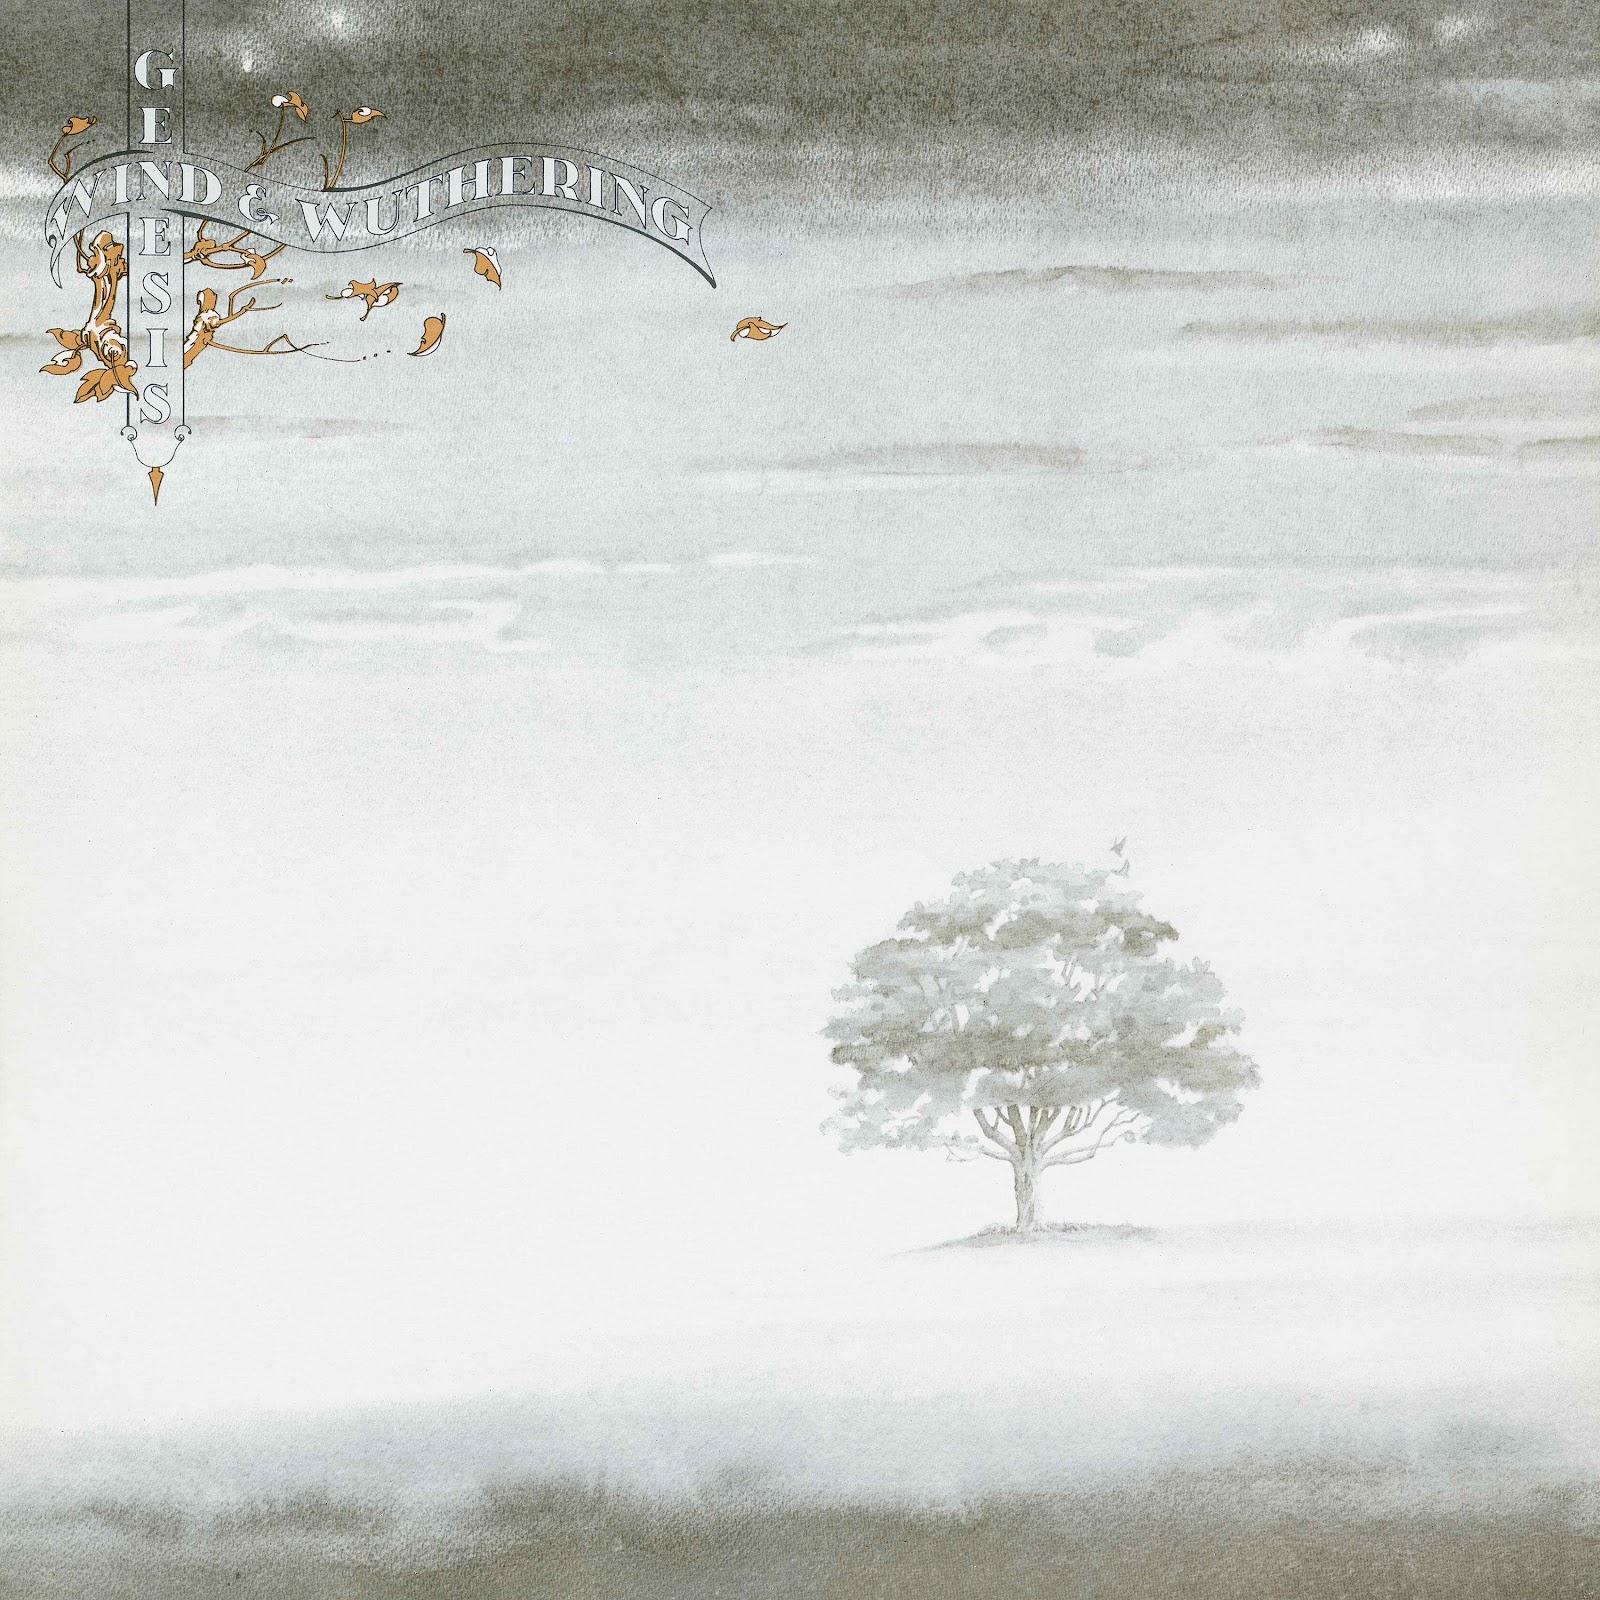 http://2.bp.blogspot.com/-adNkXbc7MWE/T33wHVb9KDI/AAAAAAAABmk/gyku1iU8vzg/s1600/Genesis+-+Wind+&+Wuthering+(1976).jpg